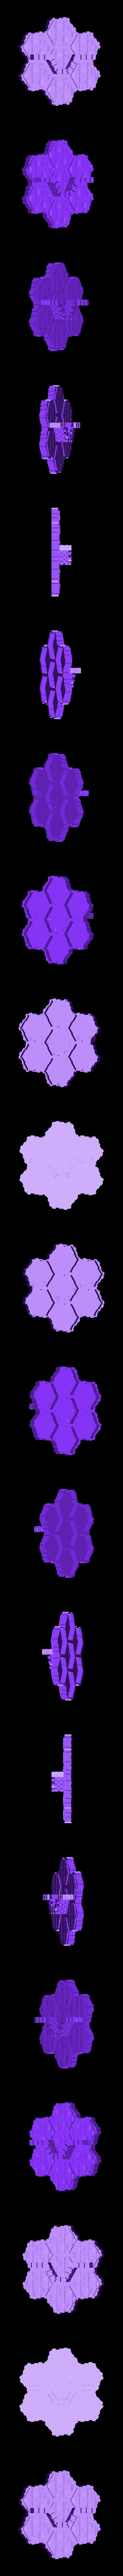 7hex_stone_with_wall_2.stl Download free STL file Locking Hex Terrain Stone Path • 3D print object, mrhers2